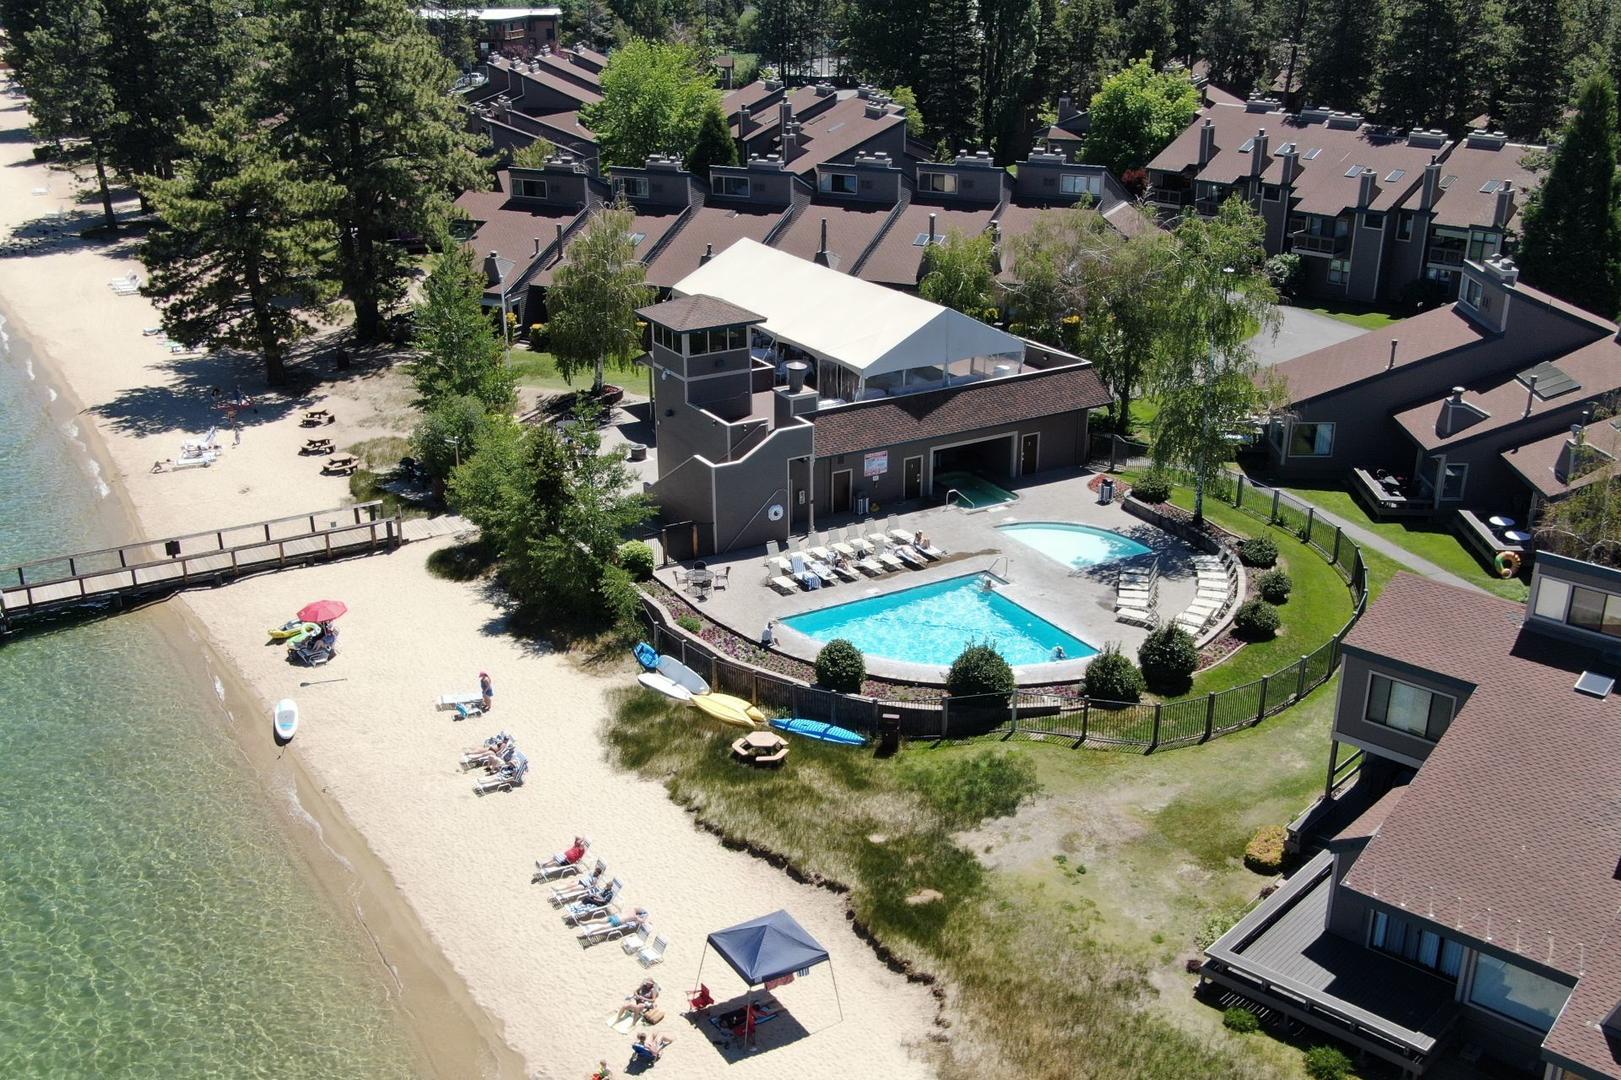 LLC0804 lakeland village pool